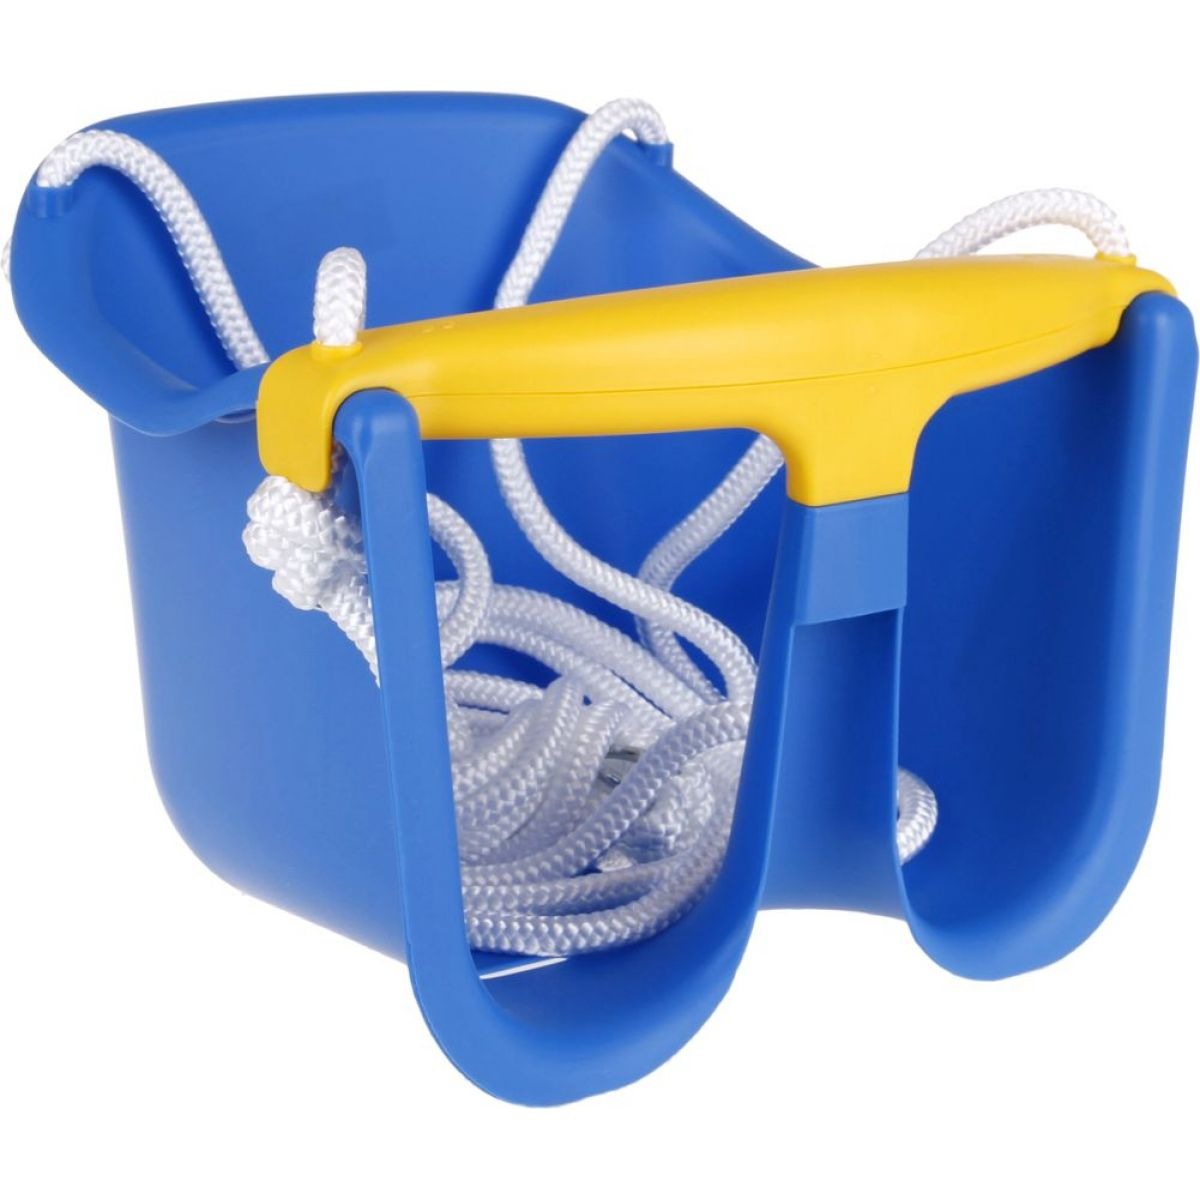 Chemoplast Hojdačka Baby plastová Modrá